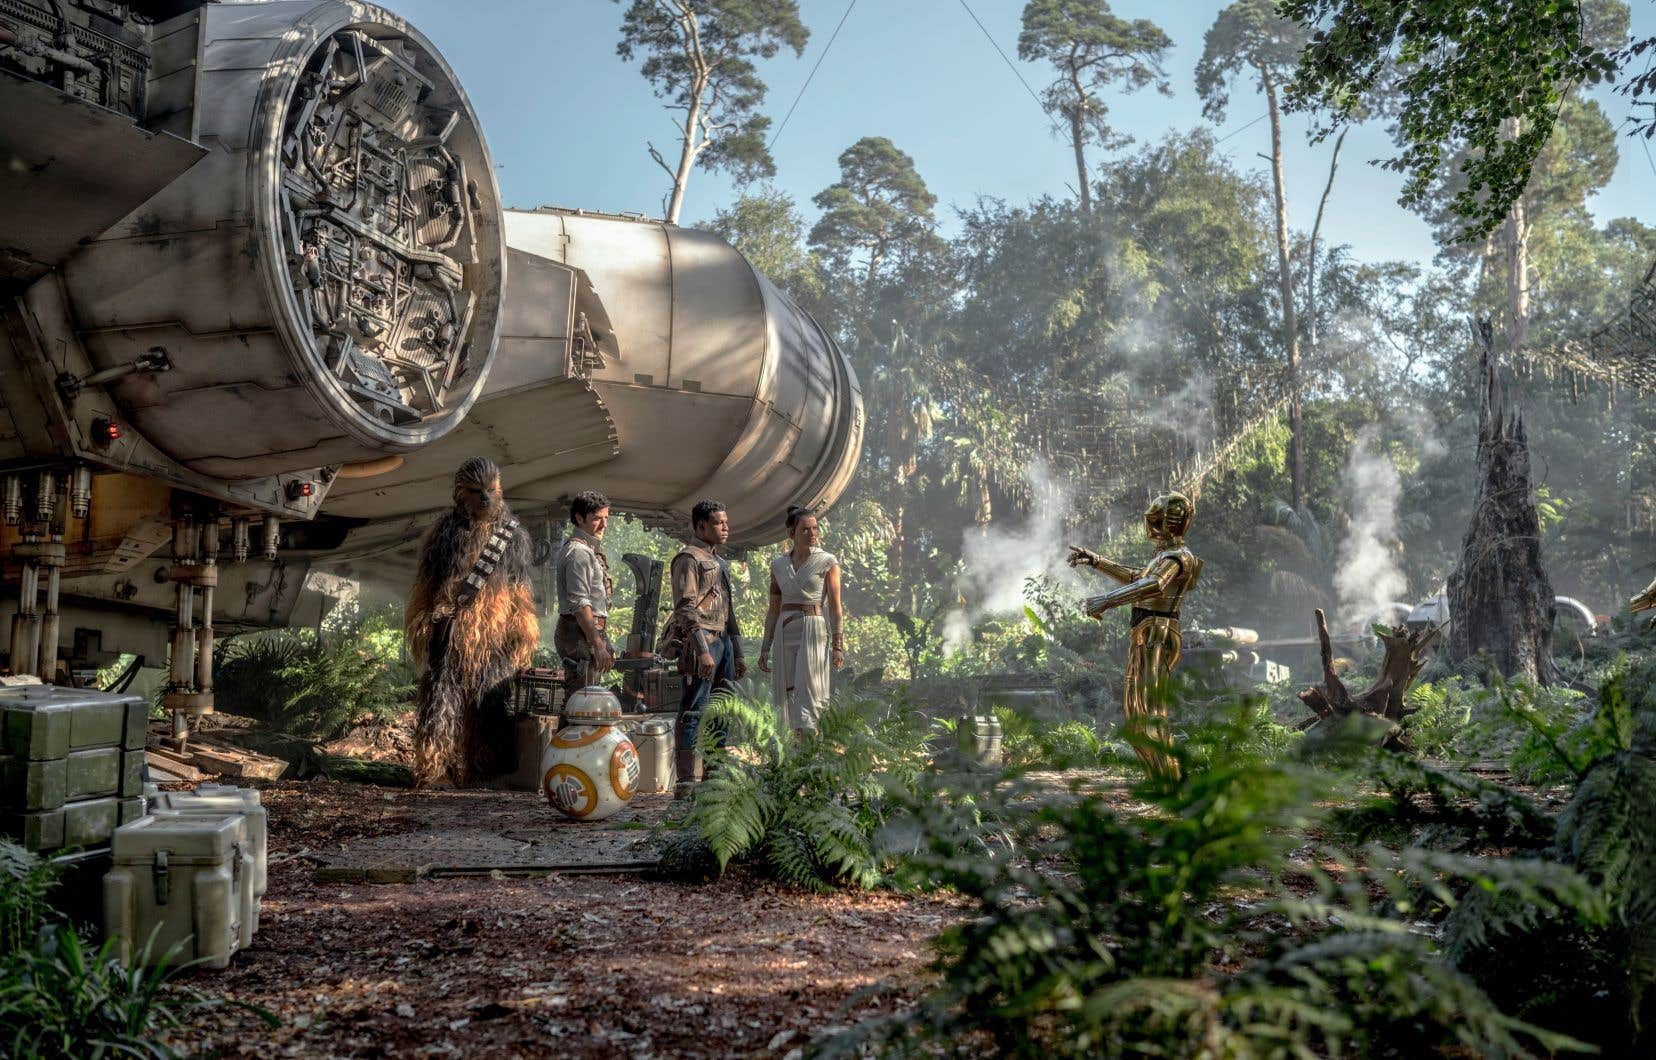 Chewbacca (Joonas Suotamo), Poe (Oscar Isaac), Finn (John Boyega), Rey (Daisy Ridley) et C-3PO (Anthony Daniels) dans «L'ascension de Skywalker».